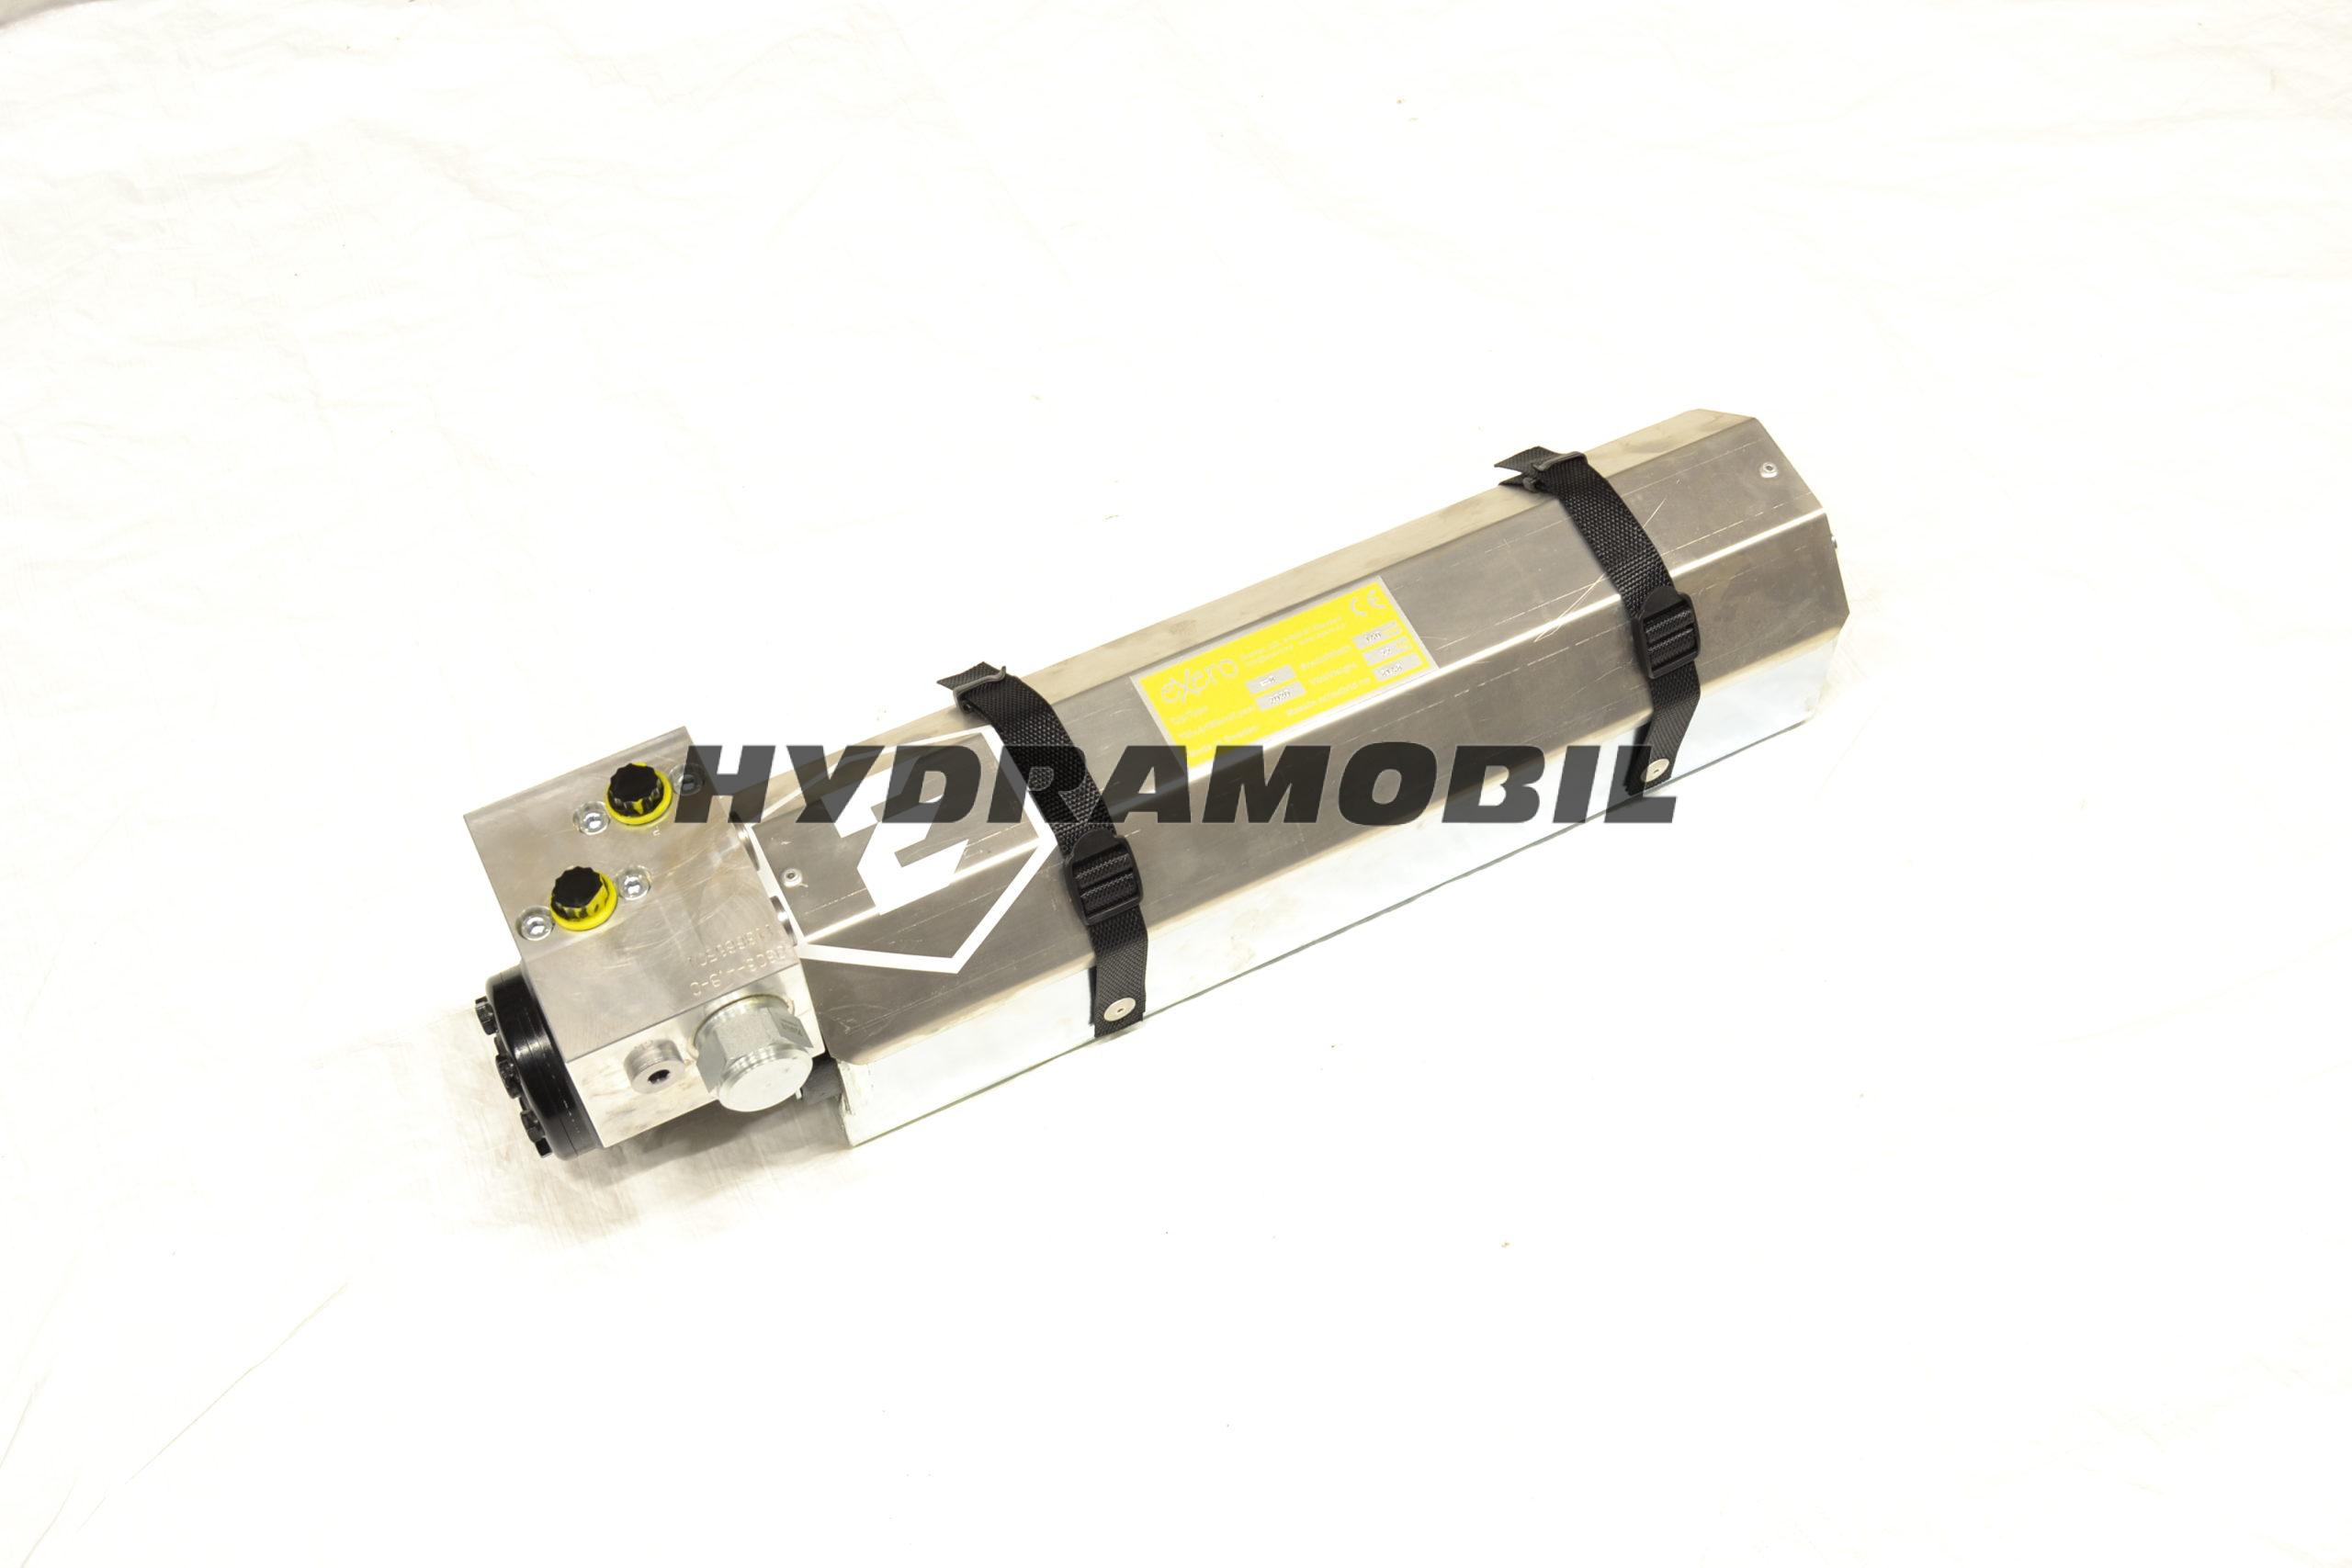 EX08 Exero Hydraul Vibrator